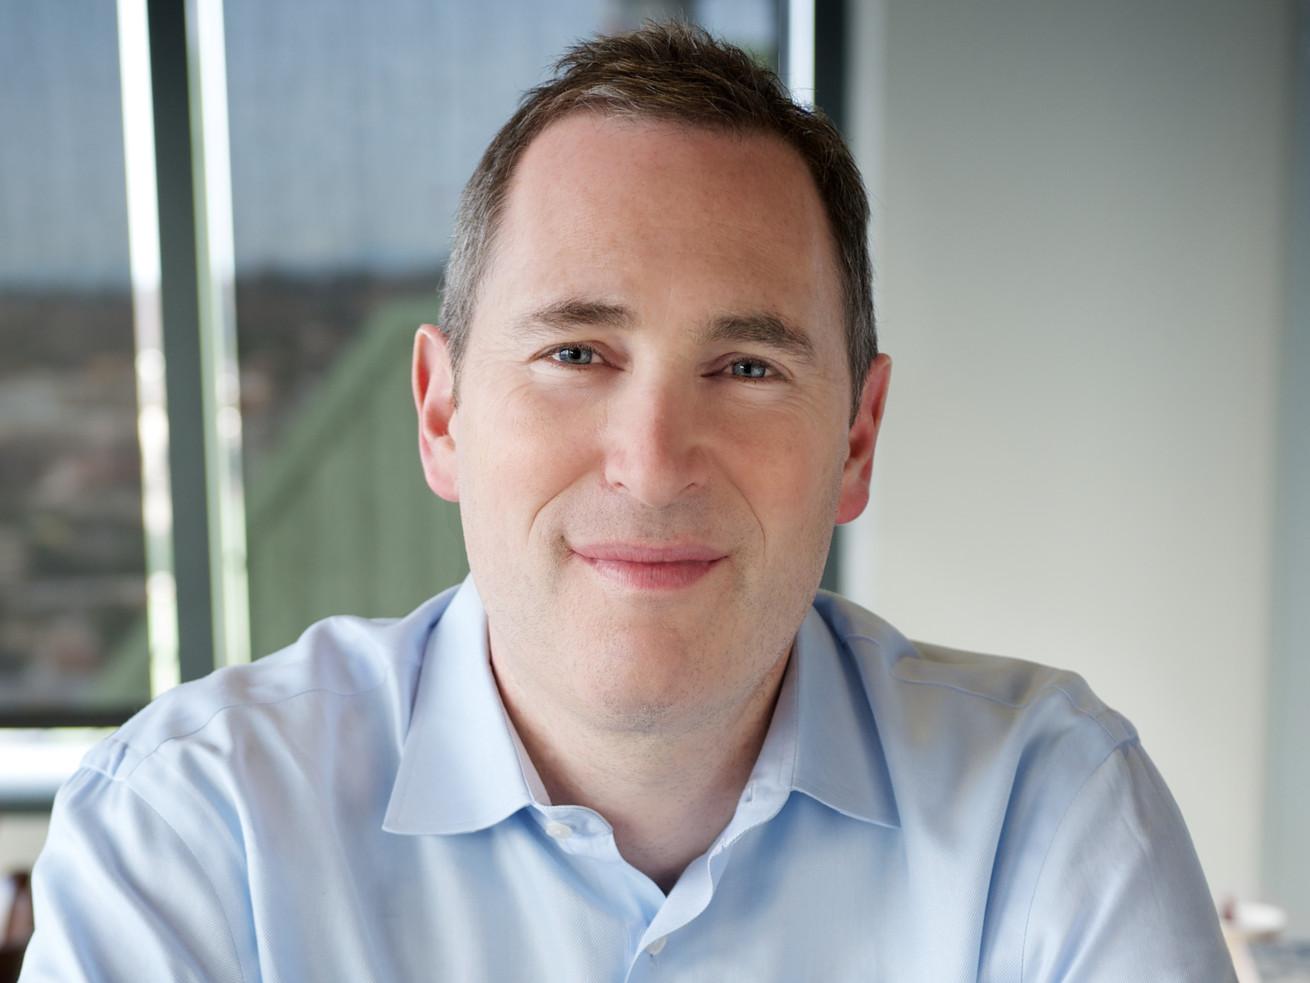 Headshot of Amazon Web Services CEO Andy Jassy.